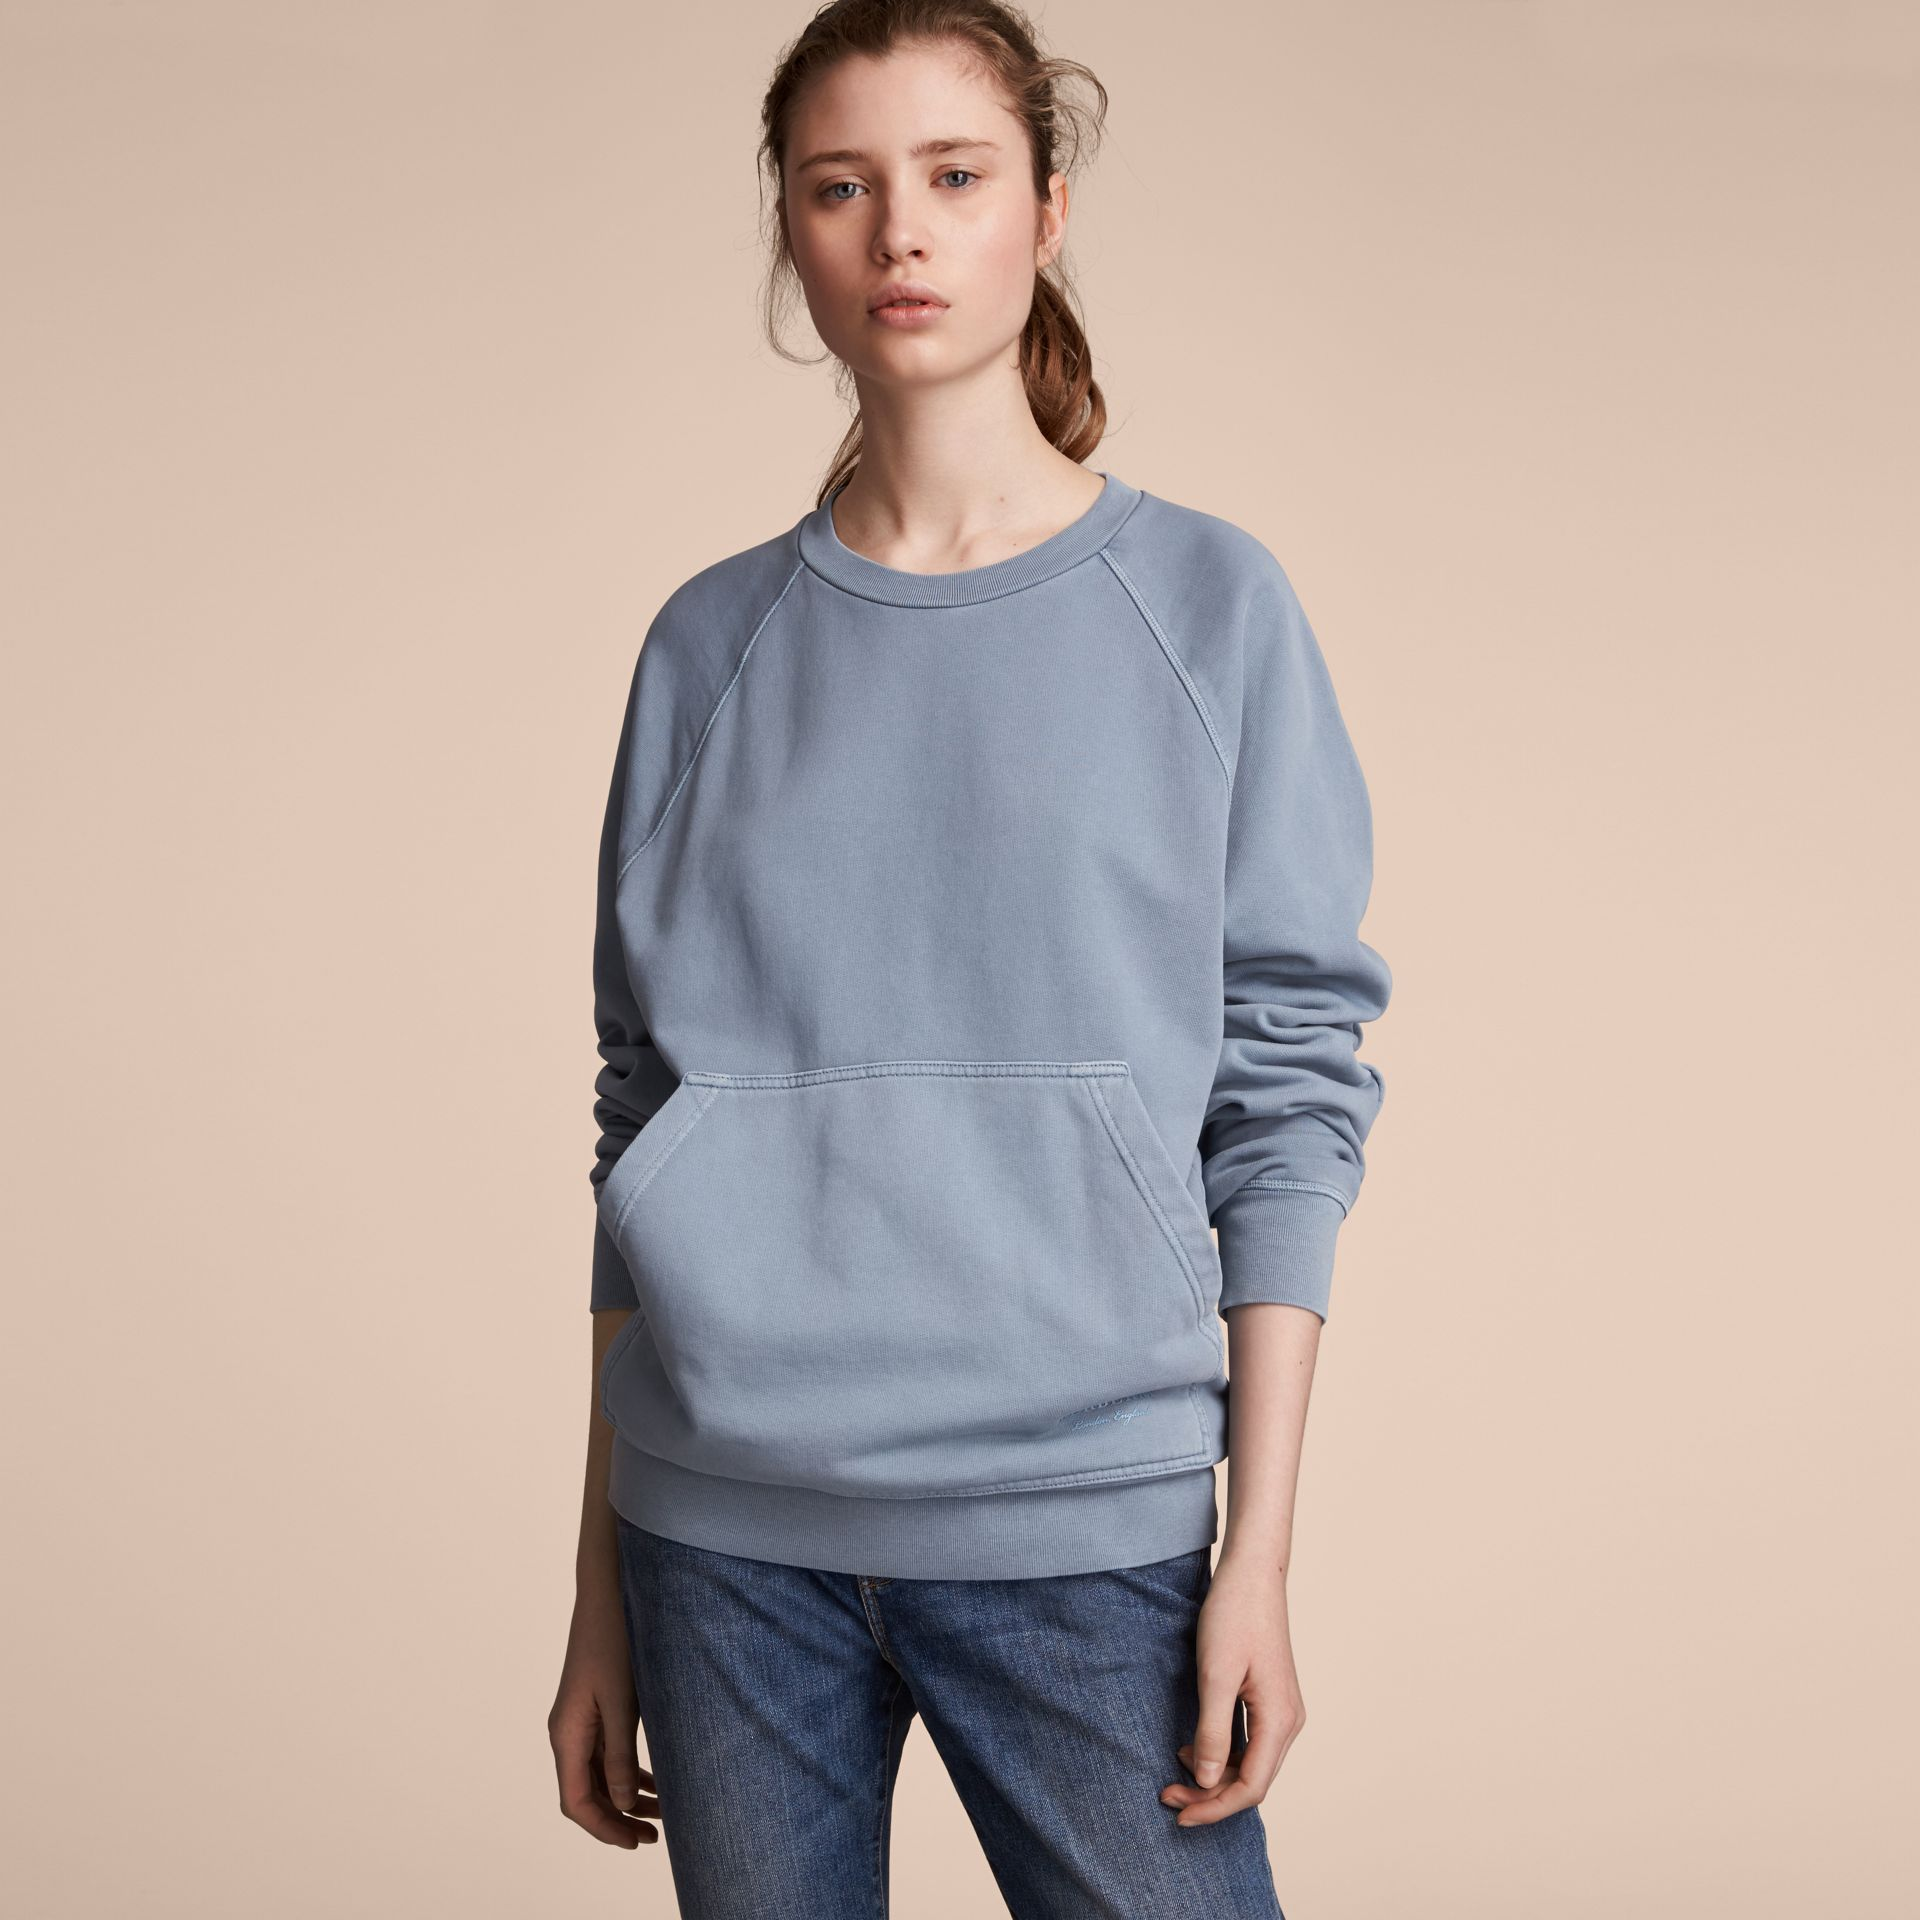 Unisex Pigment-dyed Cotton Oversize Sweatshirt in Dusty Blue - Women | Burberry Australia - gallery image 6